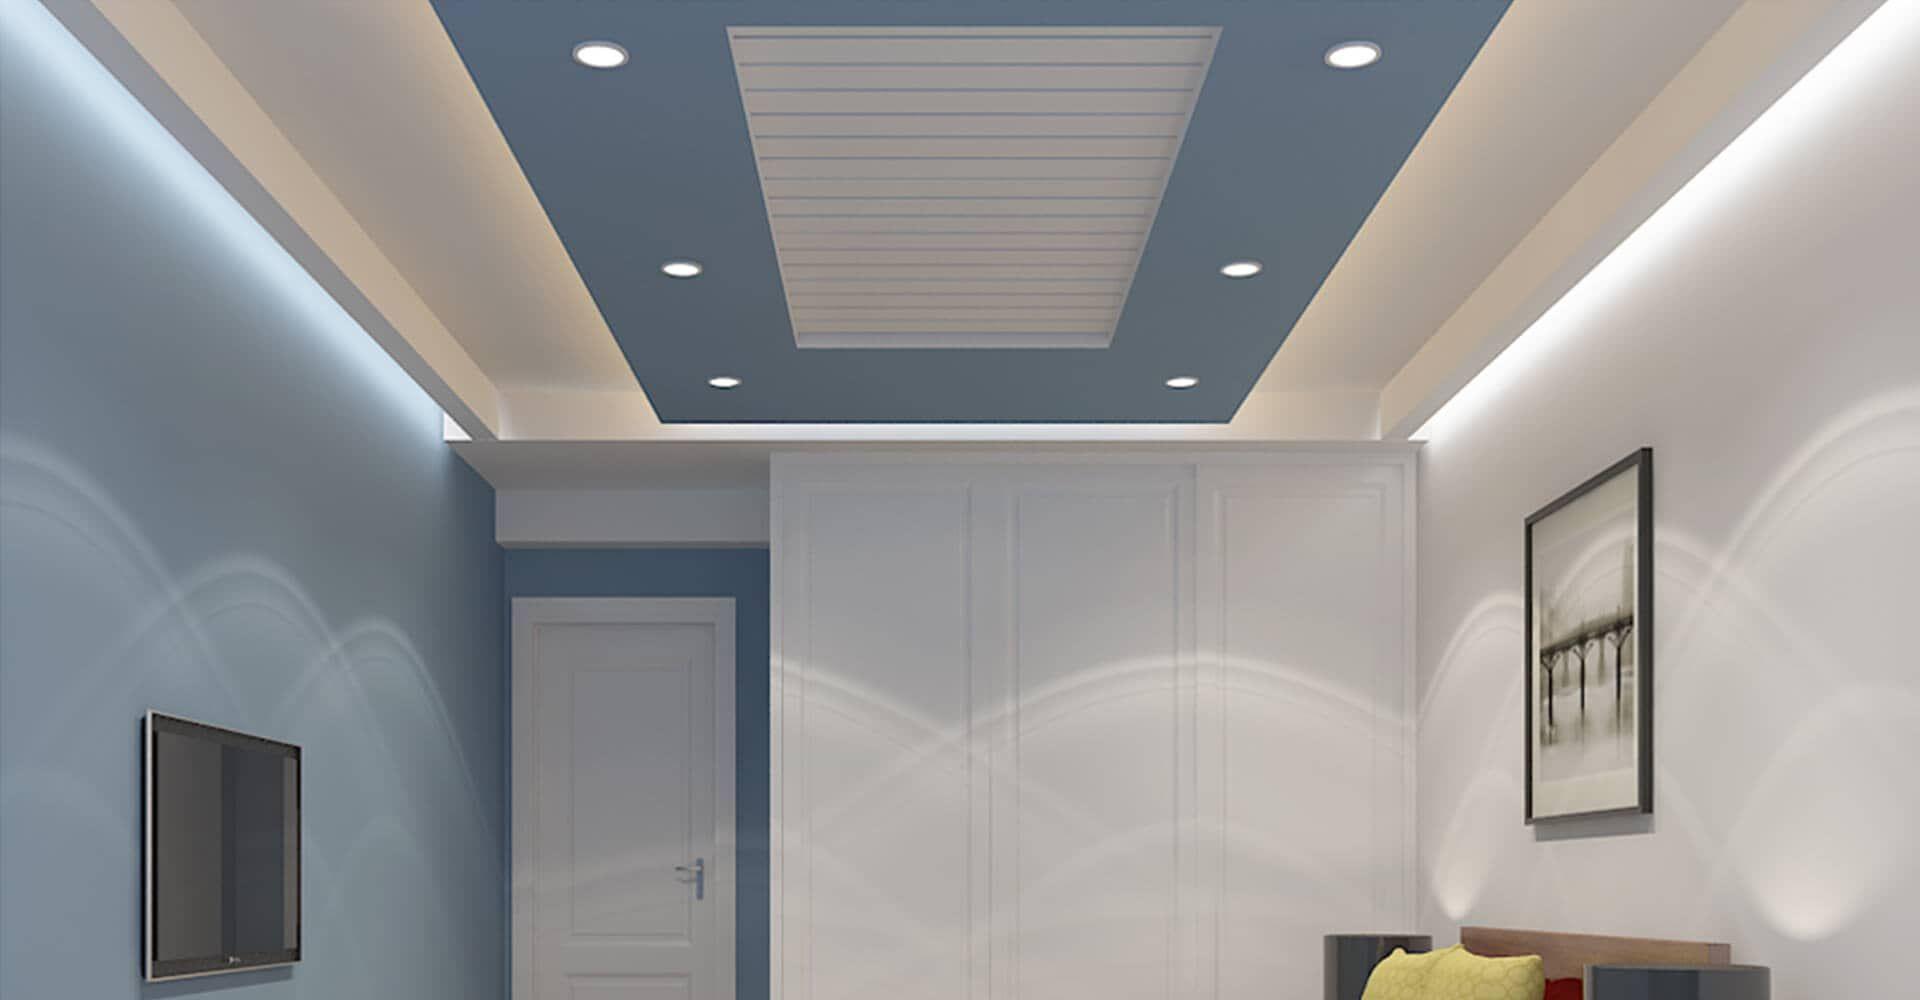 Residential False Ceiling False Ceiling Gypsum Board Drywall Plaster Saint Gobain Gyproc In Interior Ceiling Design Ceiling Design Pvc Ceiling Design Popular bedroom pvc ceiling